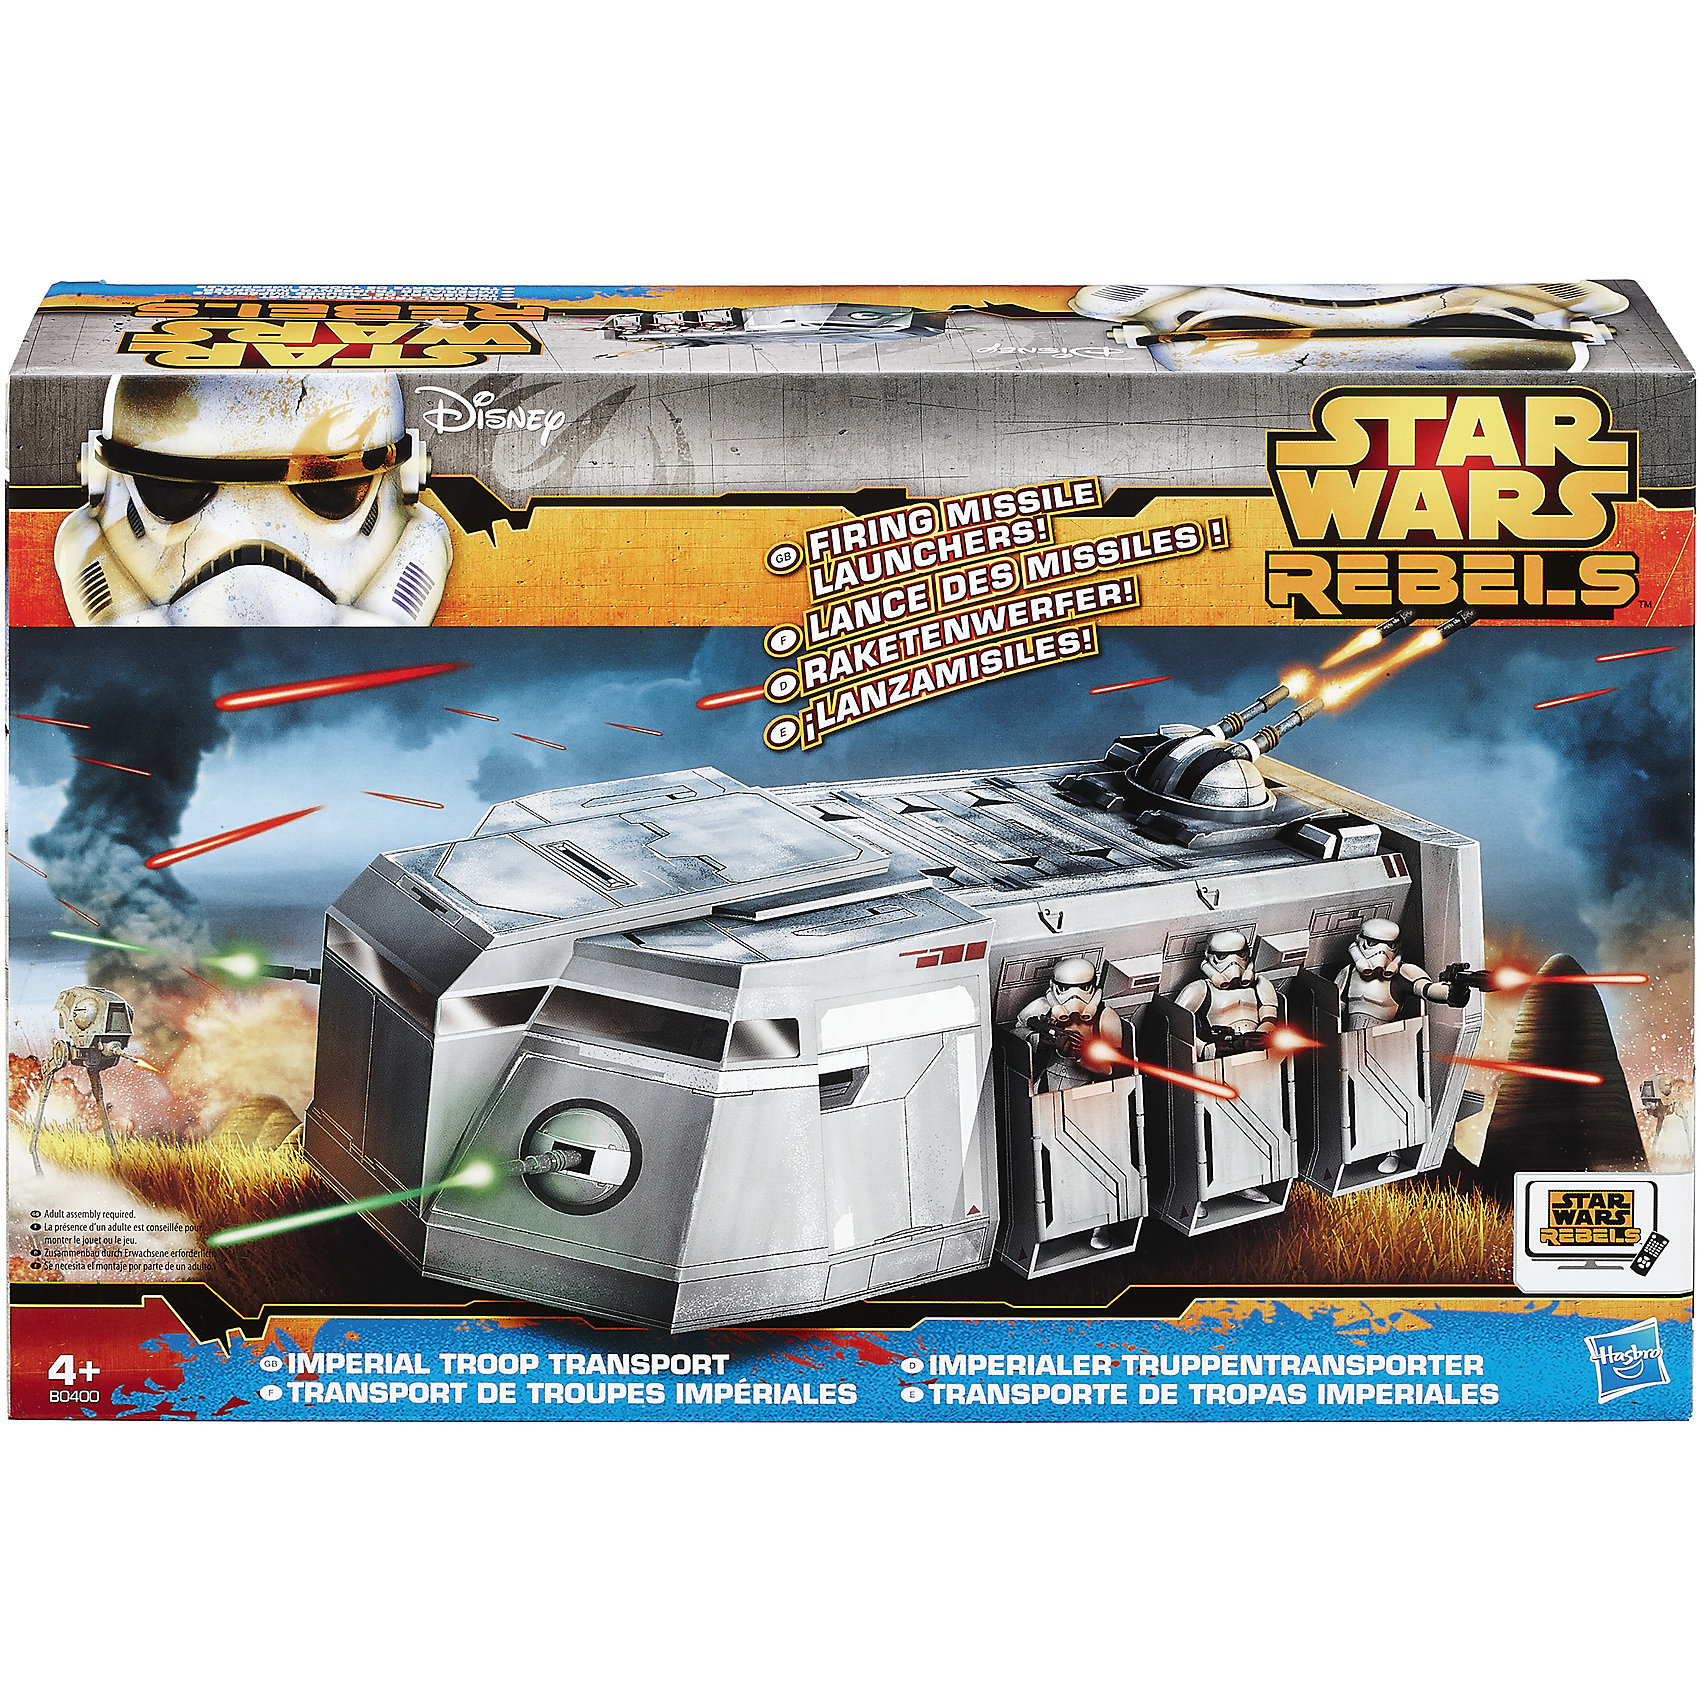 ������ ������������ ��������, ����� 2, Star Wars (Hasbro)